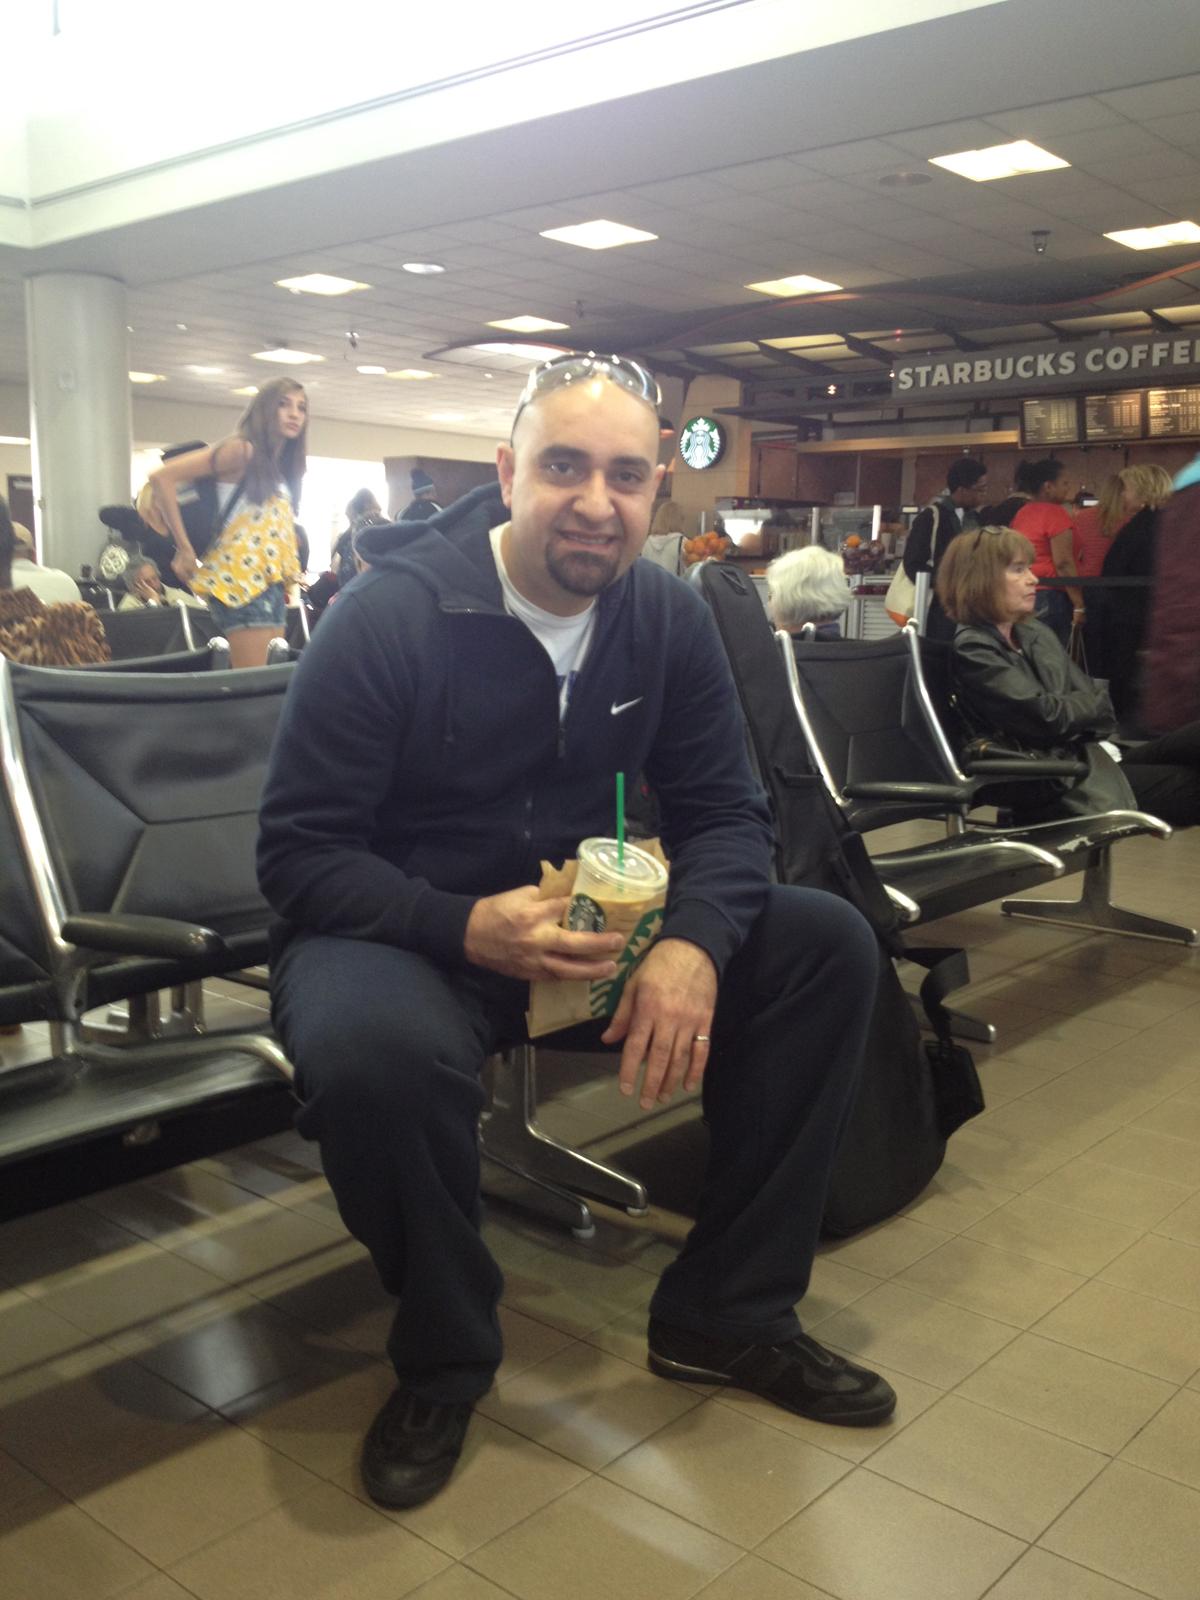 Airport Waiting...